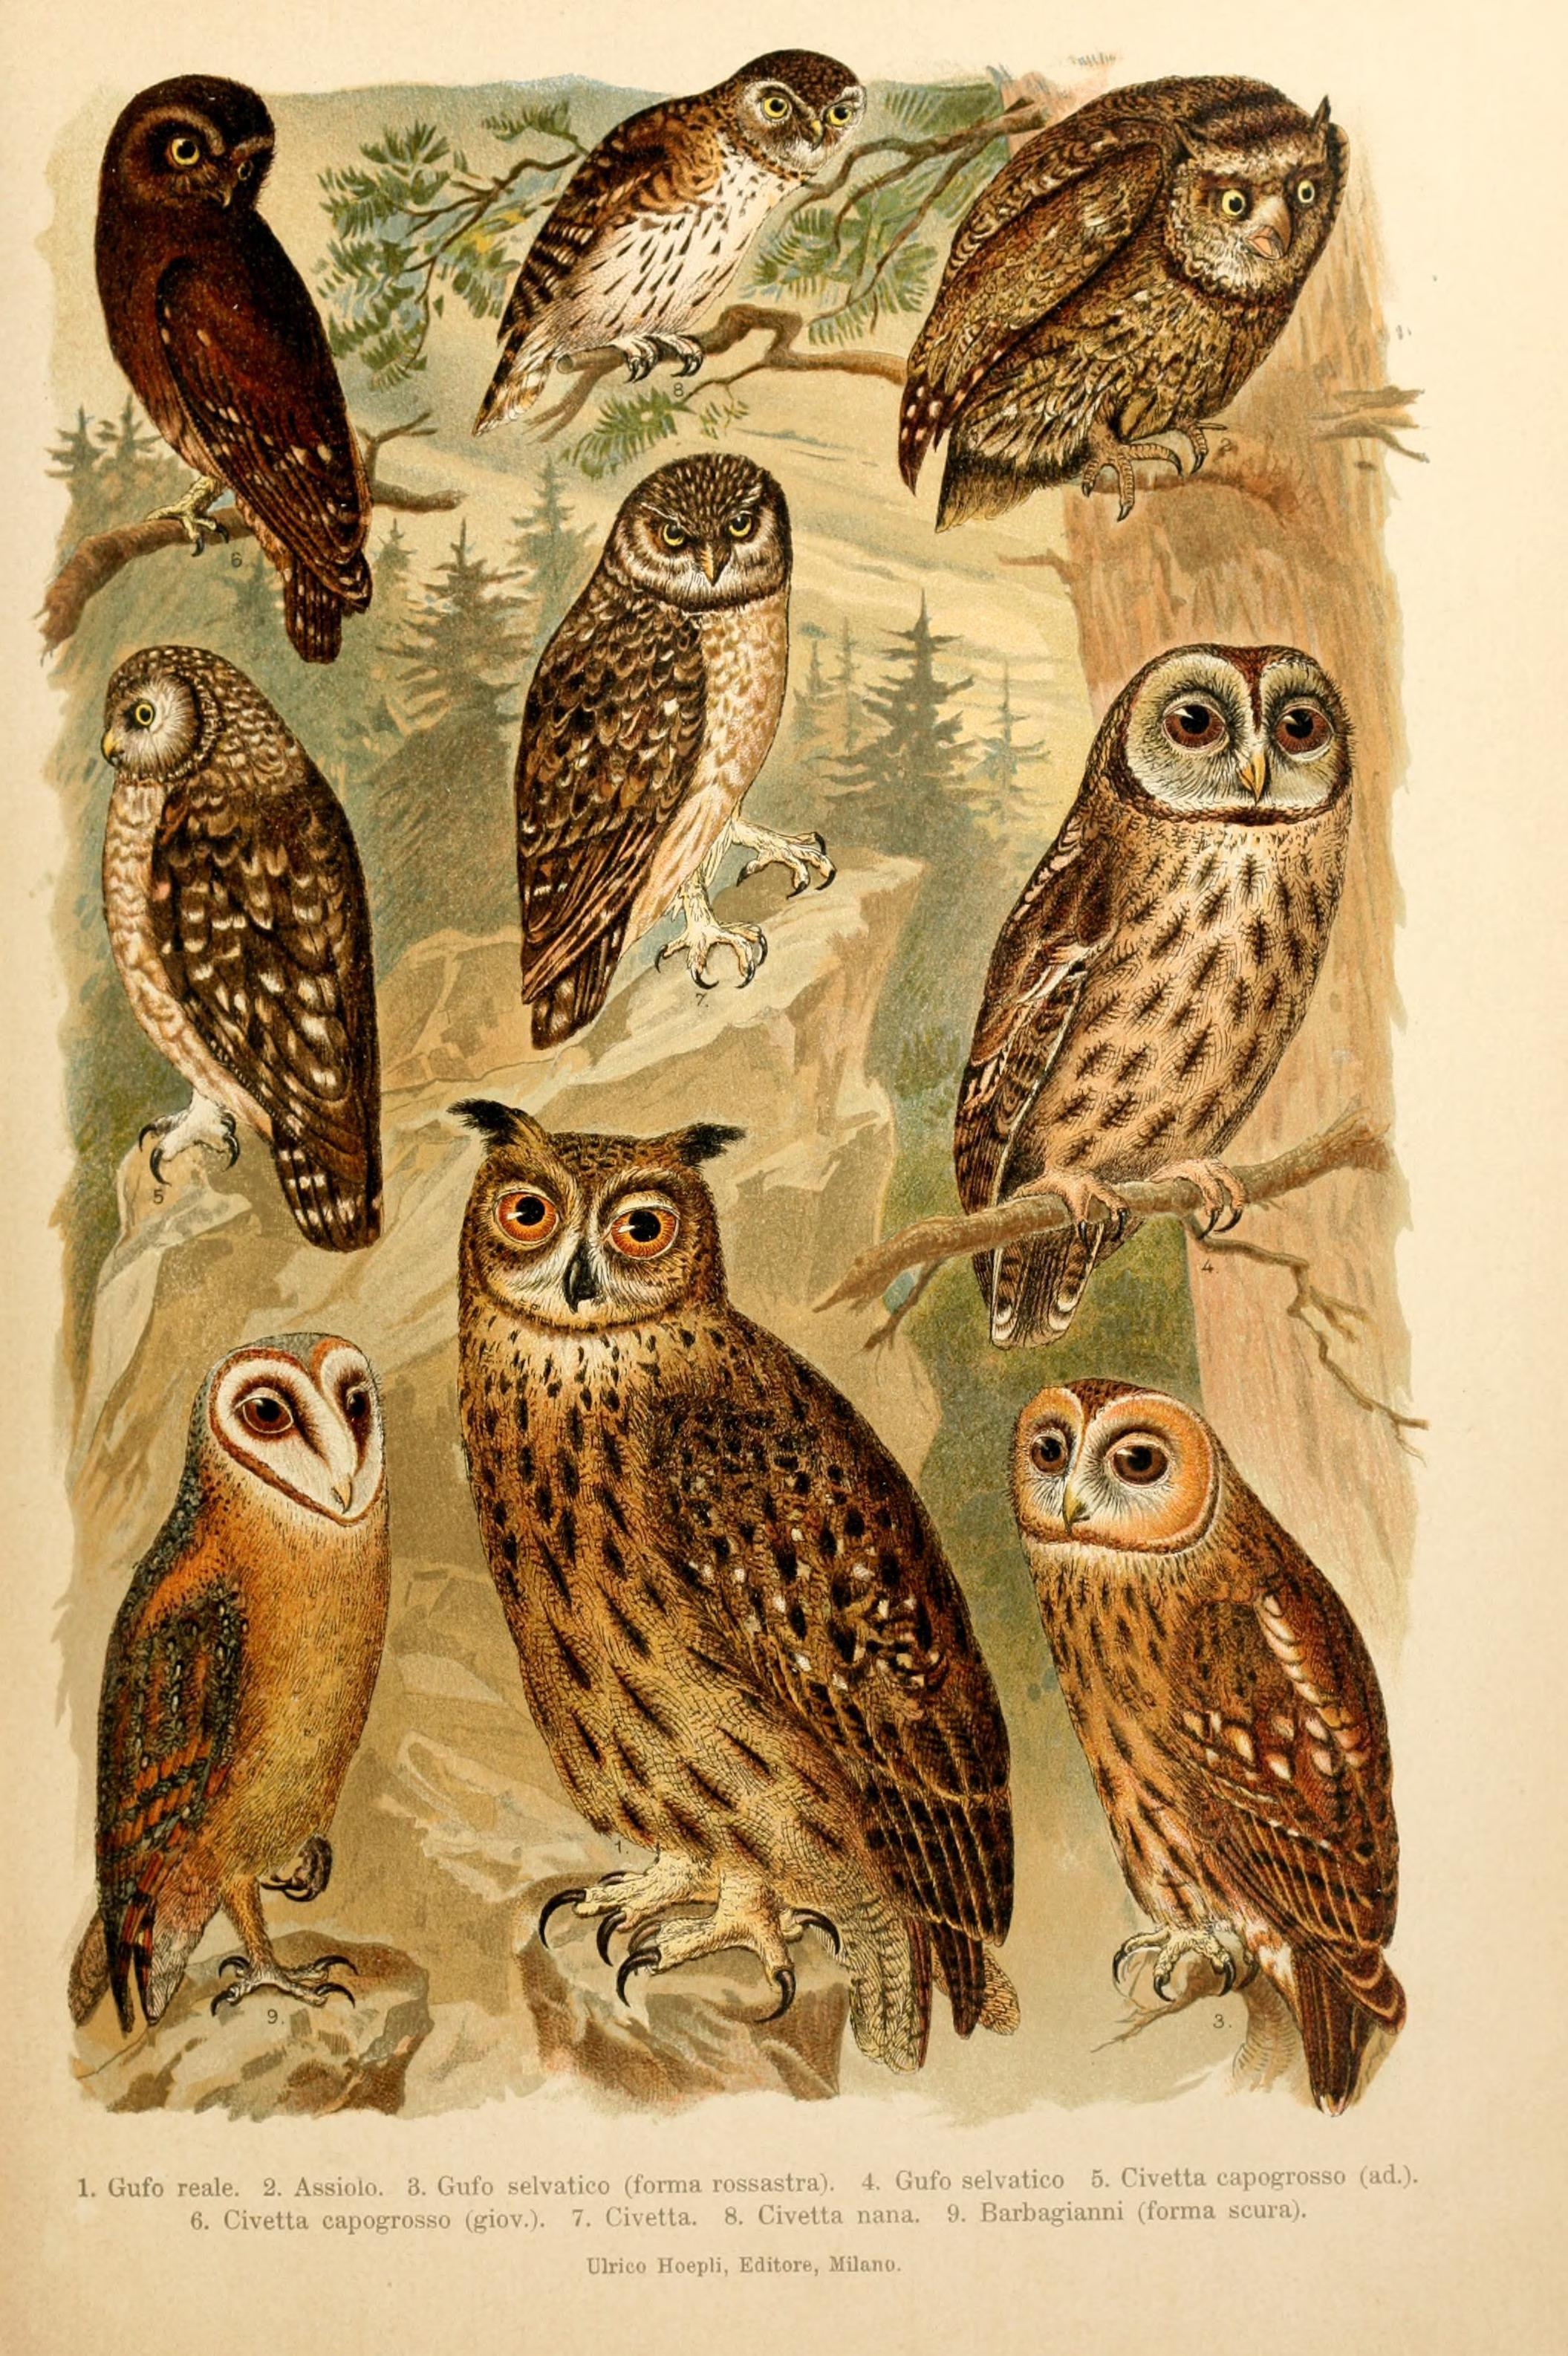 Atlante Ornitologico Biodiversity Heritage Library Owl Illustration Owl Vintage Owl